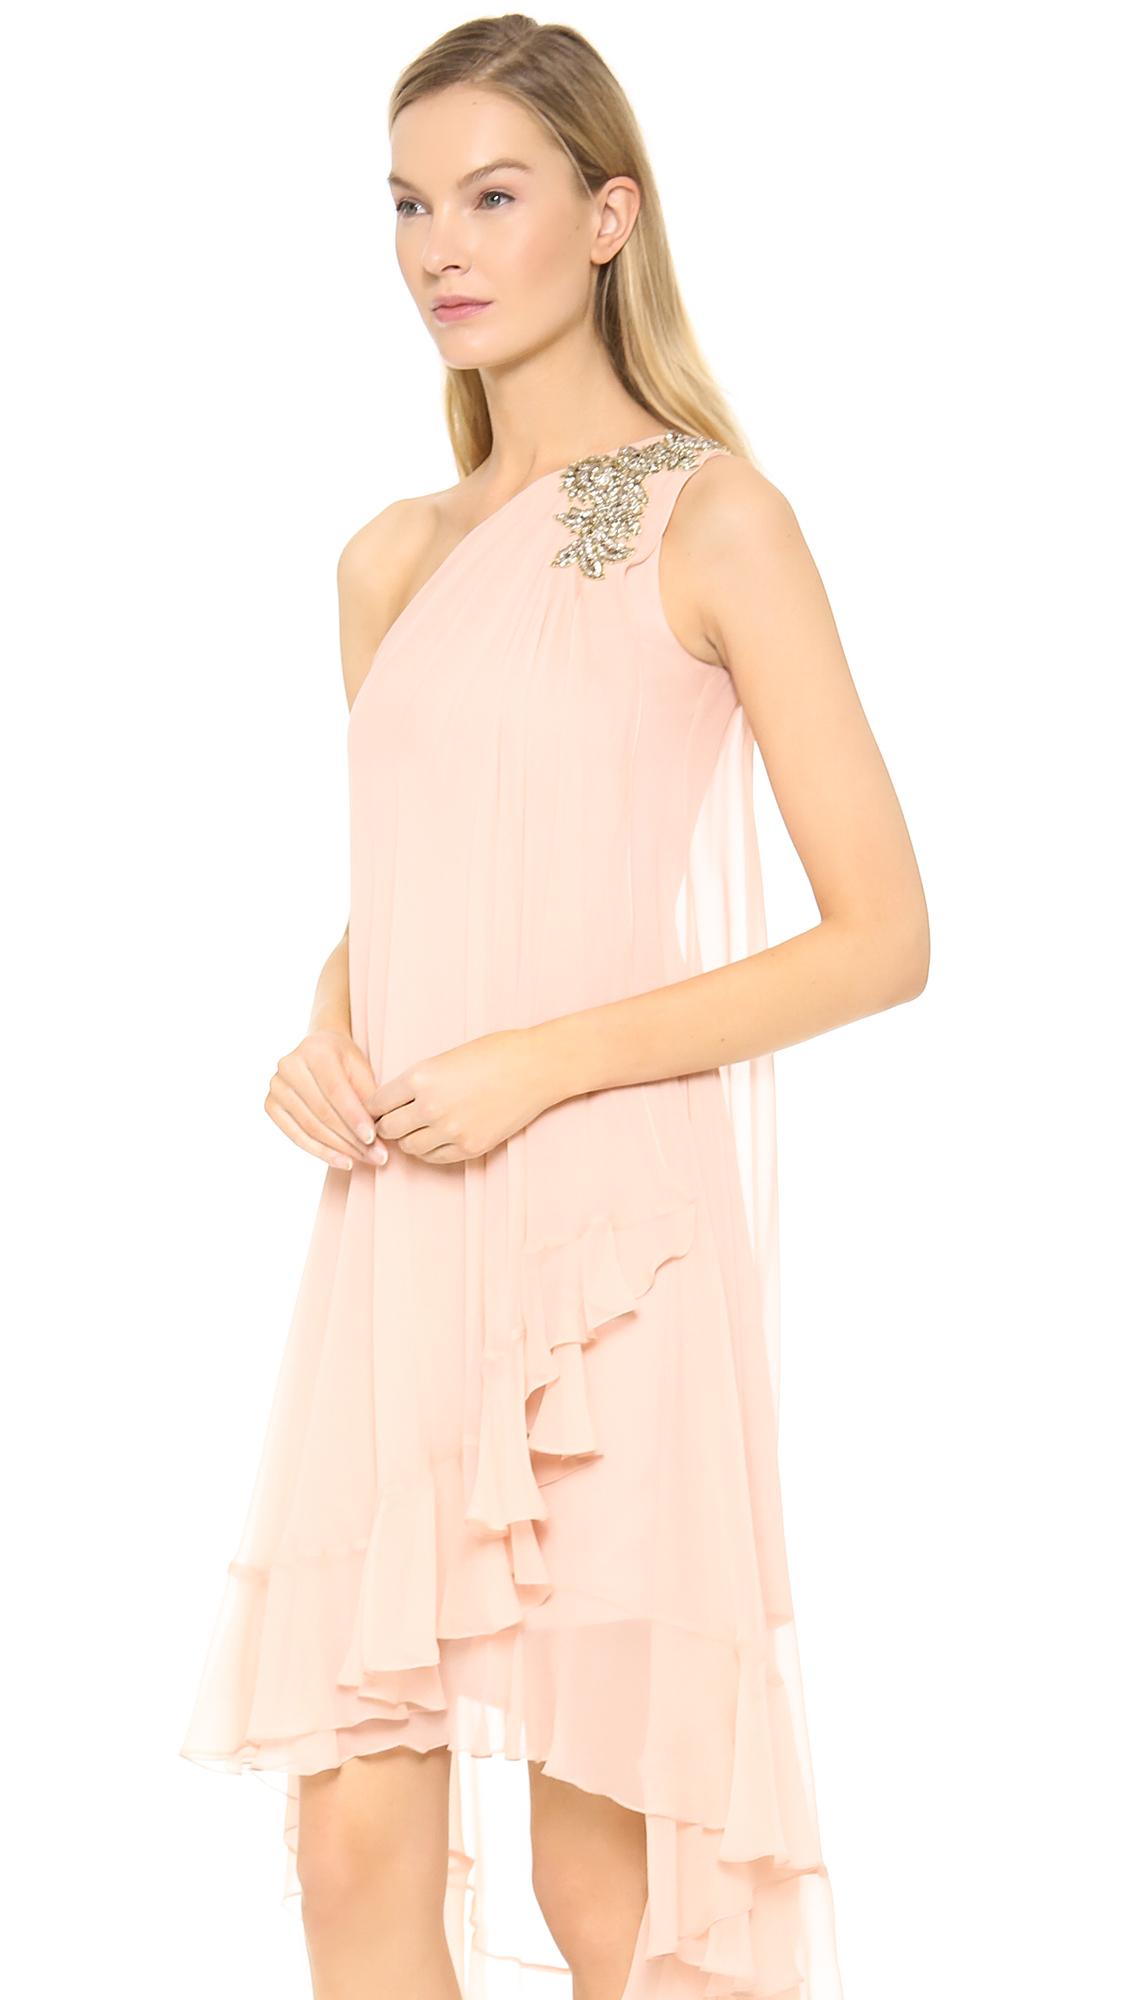 Lyst - Notte By Marchesa One Shoulder Chiffon Cocktail Dress Blush ...